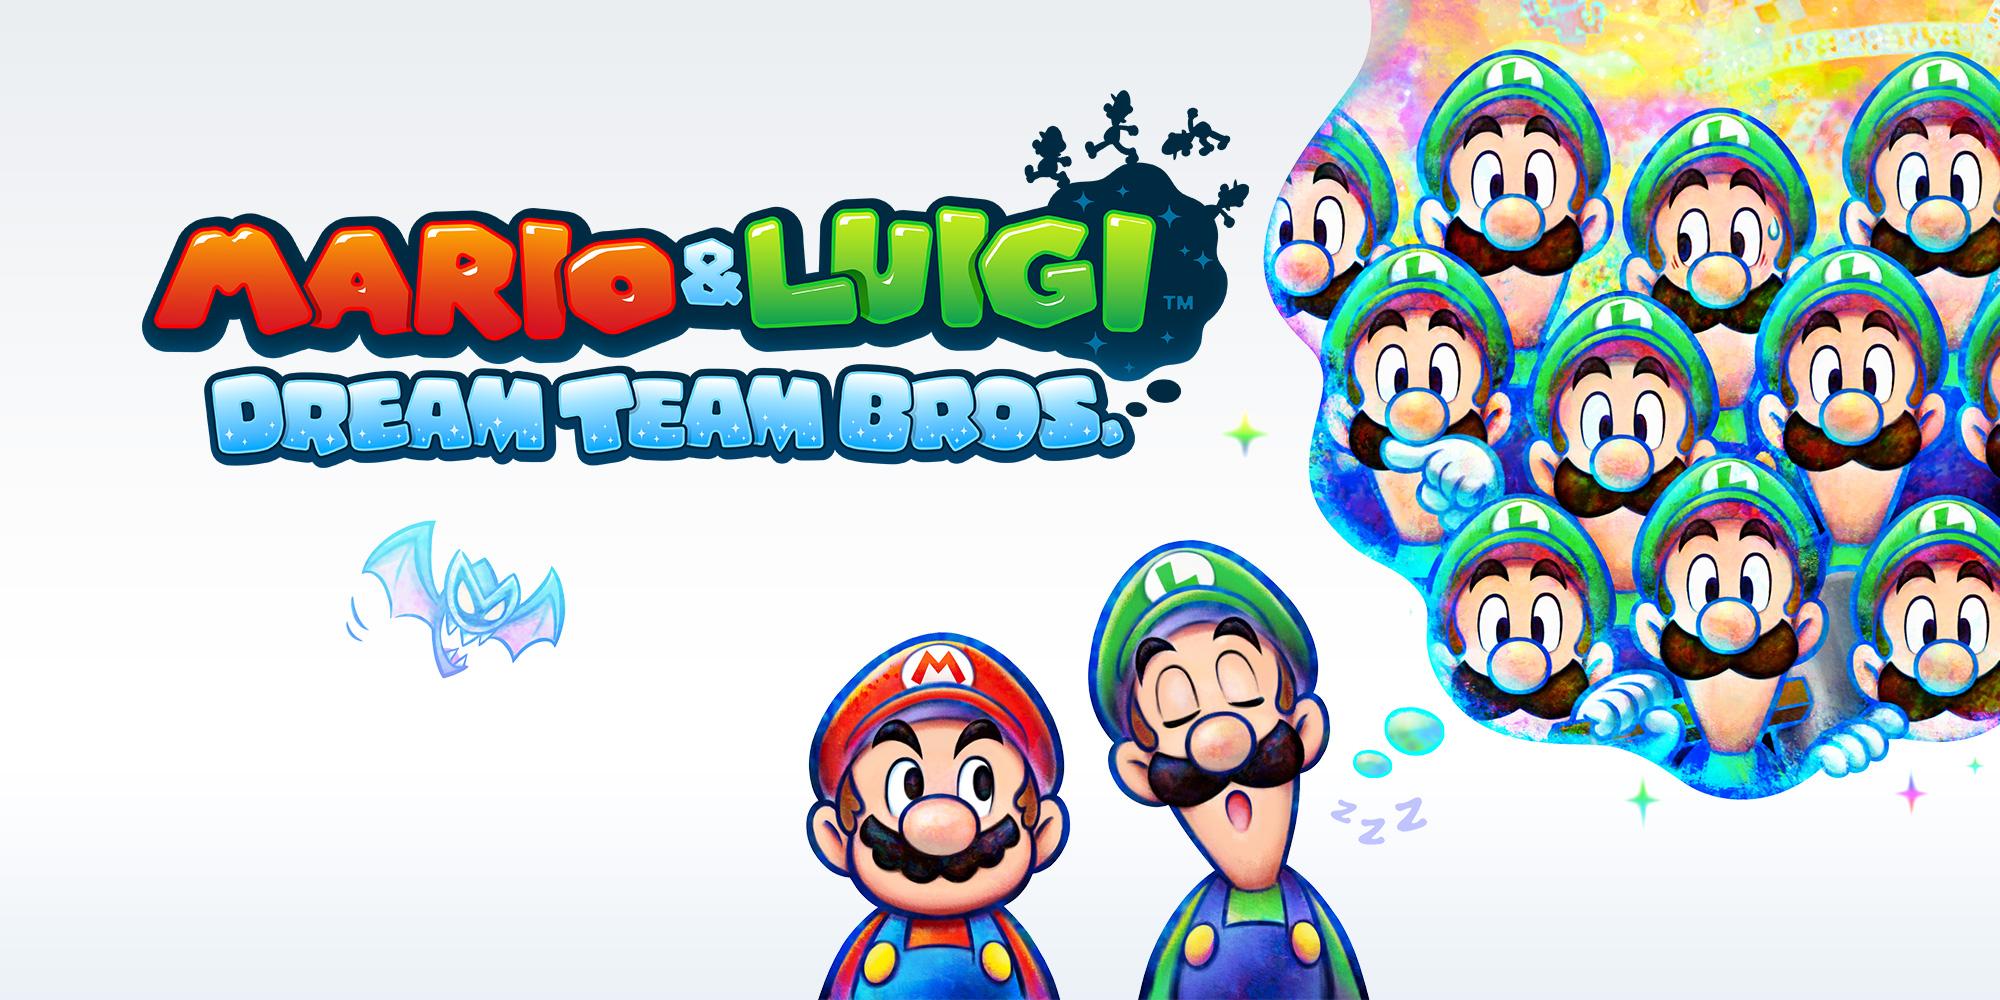 Mario Luigi Dream Team Bros Nintendo 3ds Games Nintendo